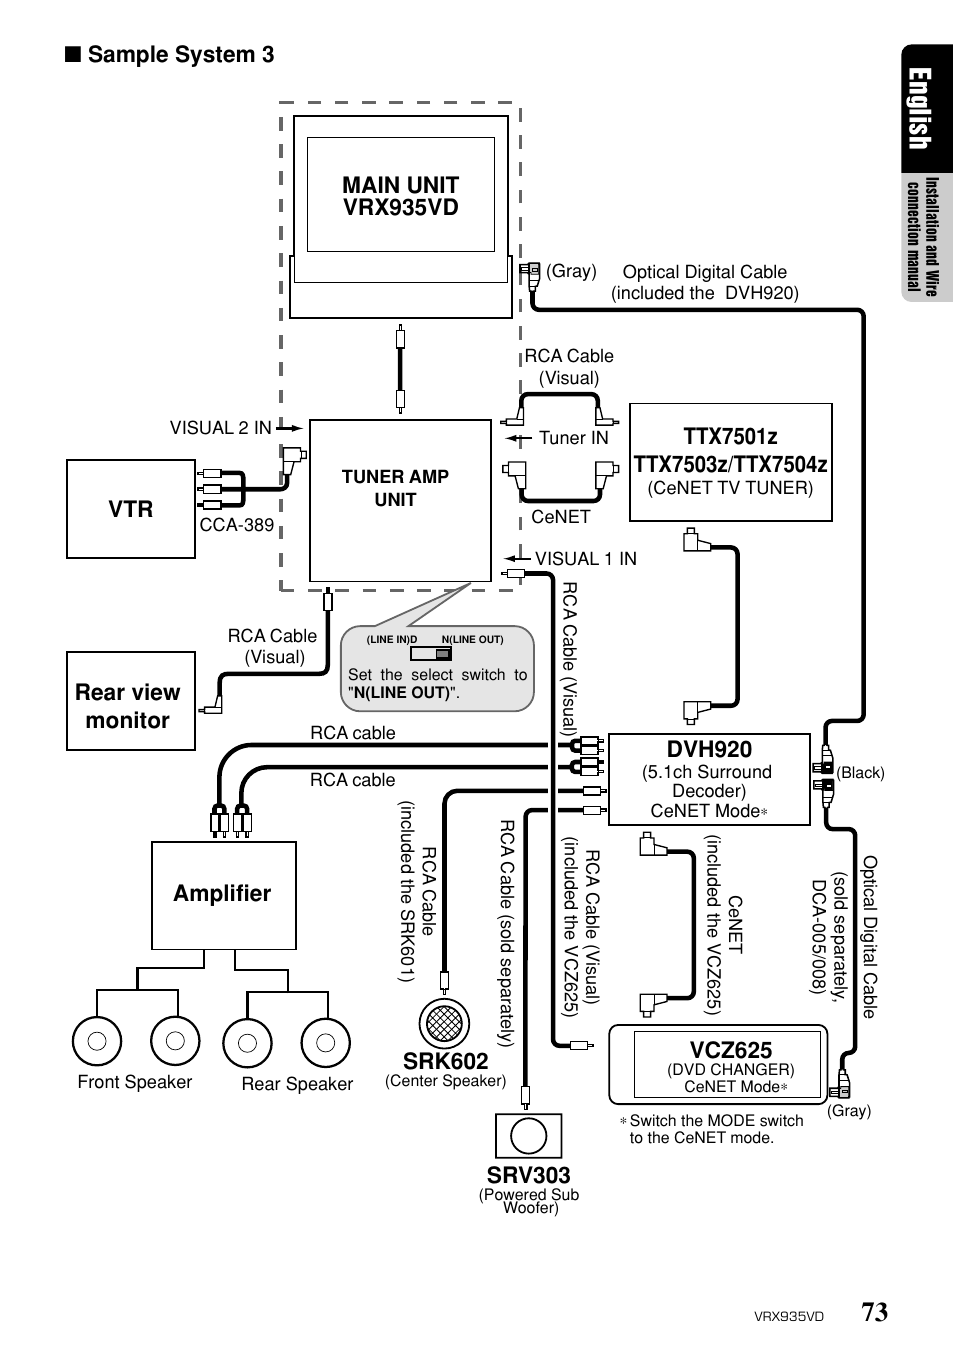 clarion vrx935vd wiring diagram - wiring diagram virtual fretboard on  clarion cmd6 wiring-diagram, clarion drb wiring diagram car radio